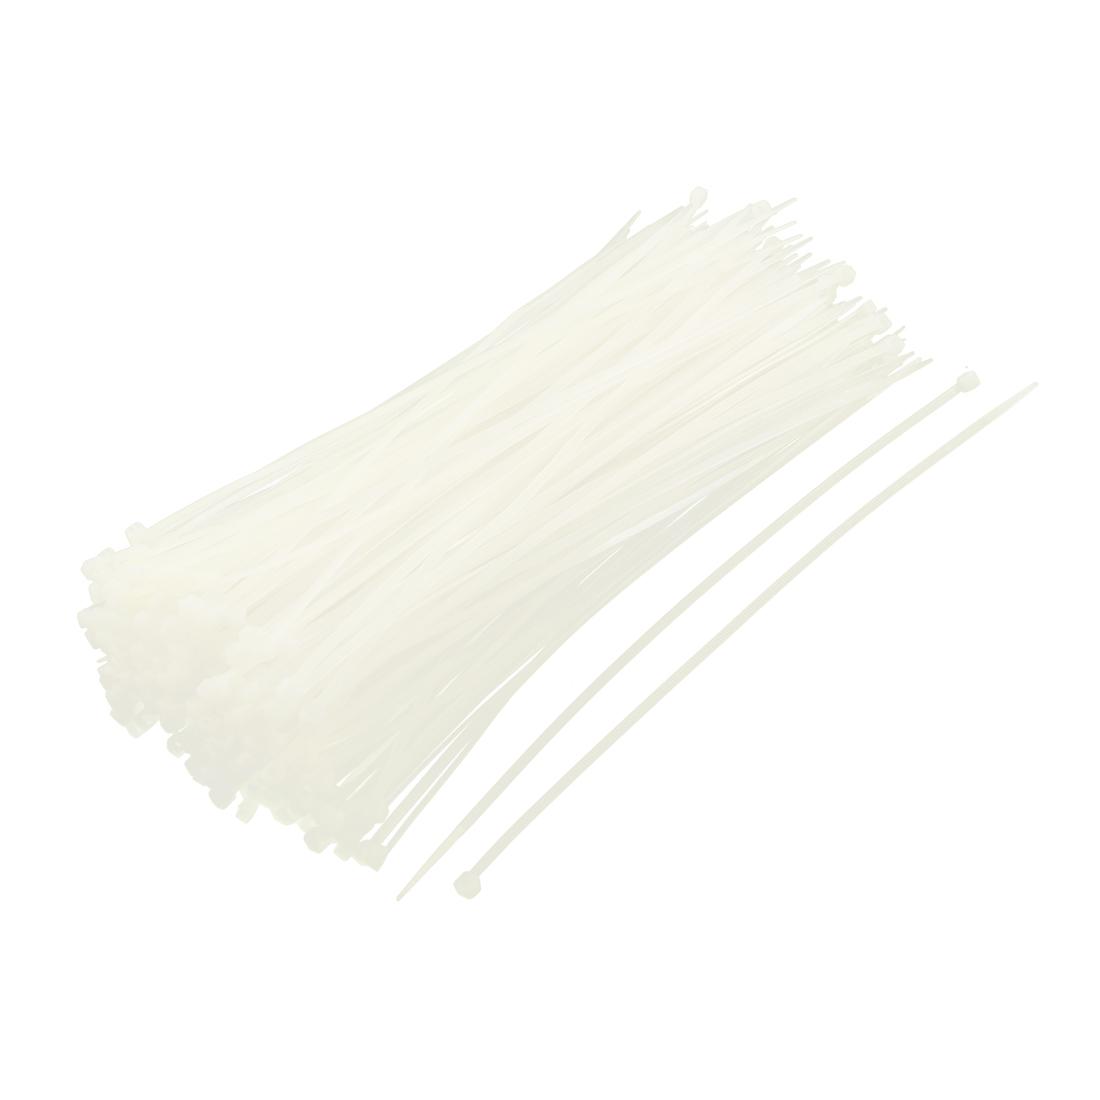 4mmx250mm Network Nylon Plastic Zip Trim Wrap Loop Cable Tie Beige 250 Pcs